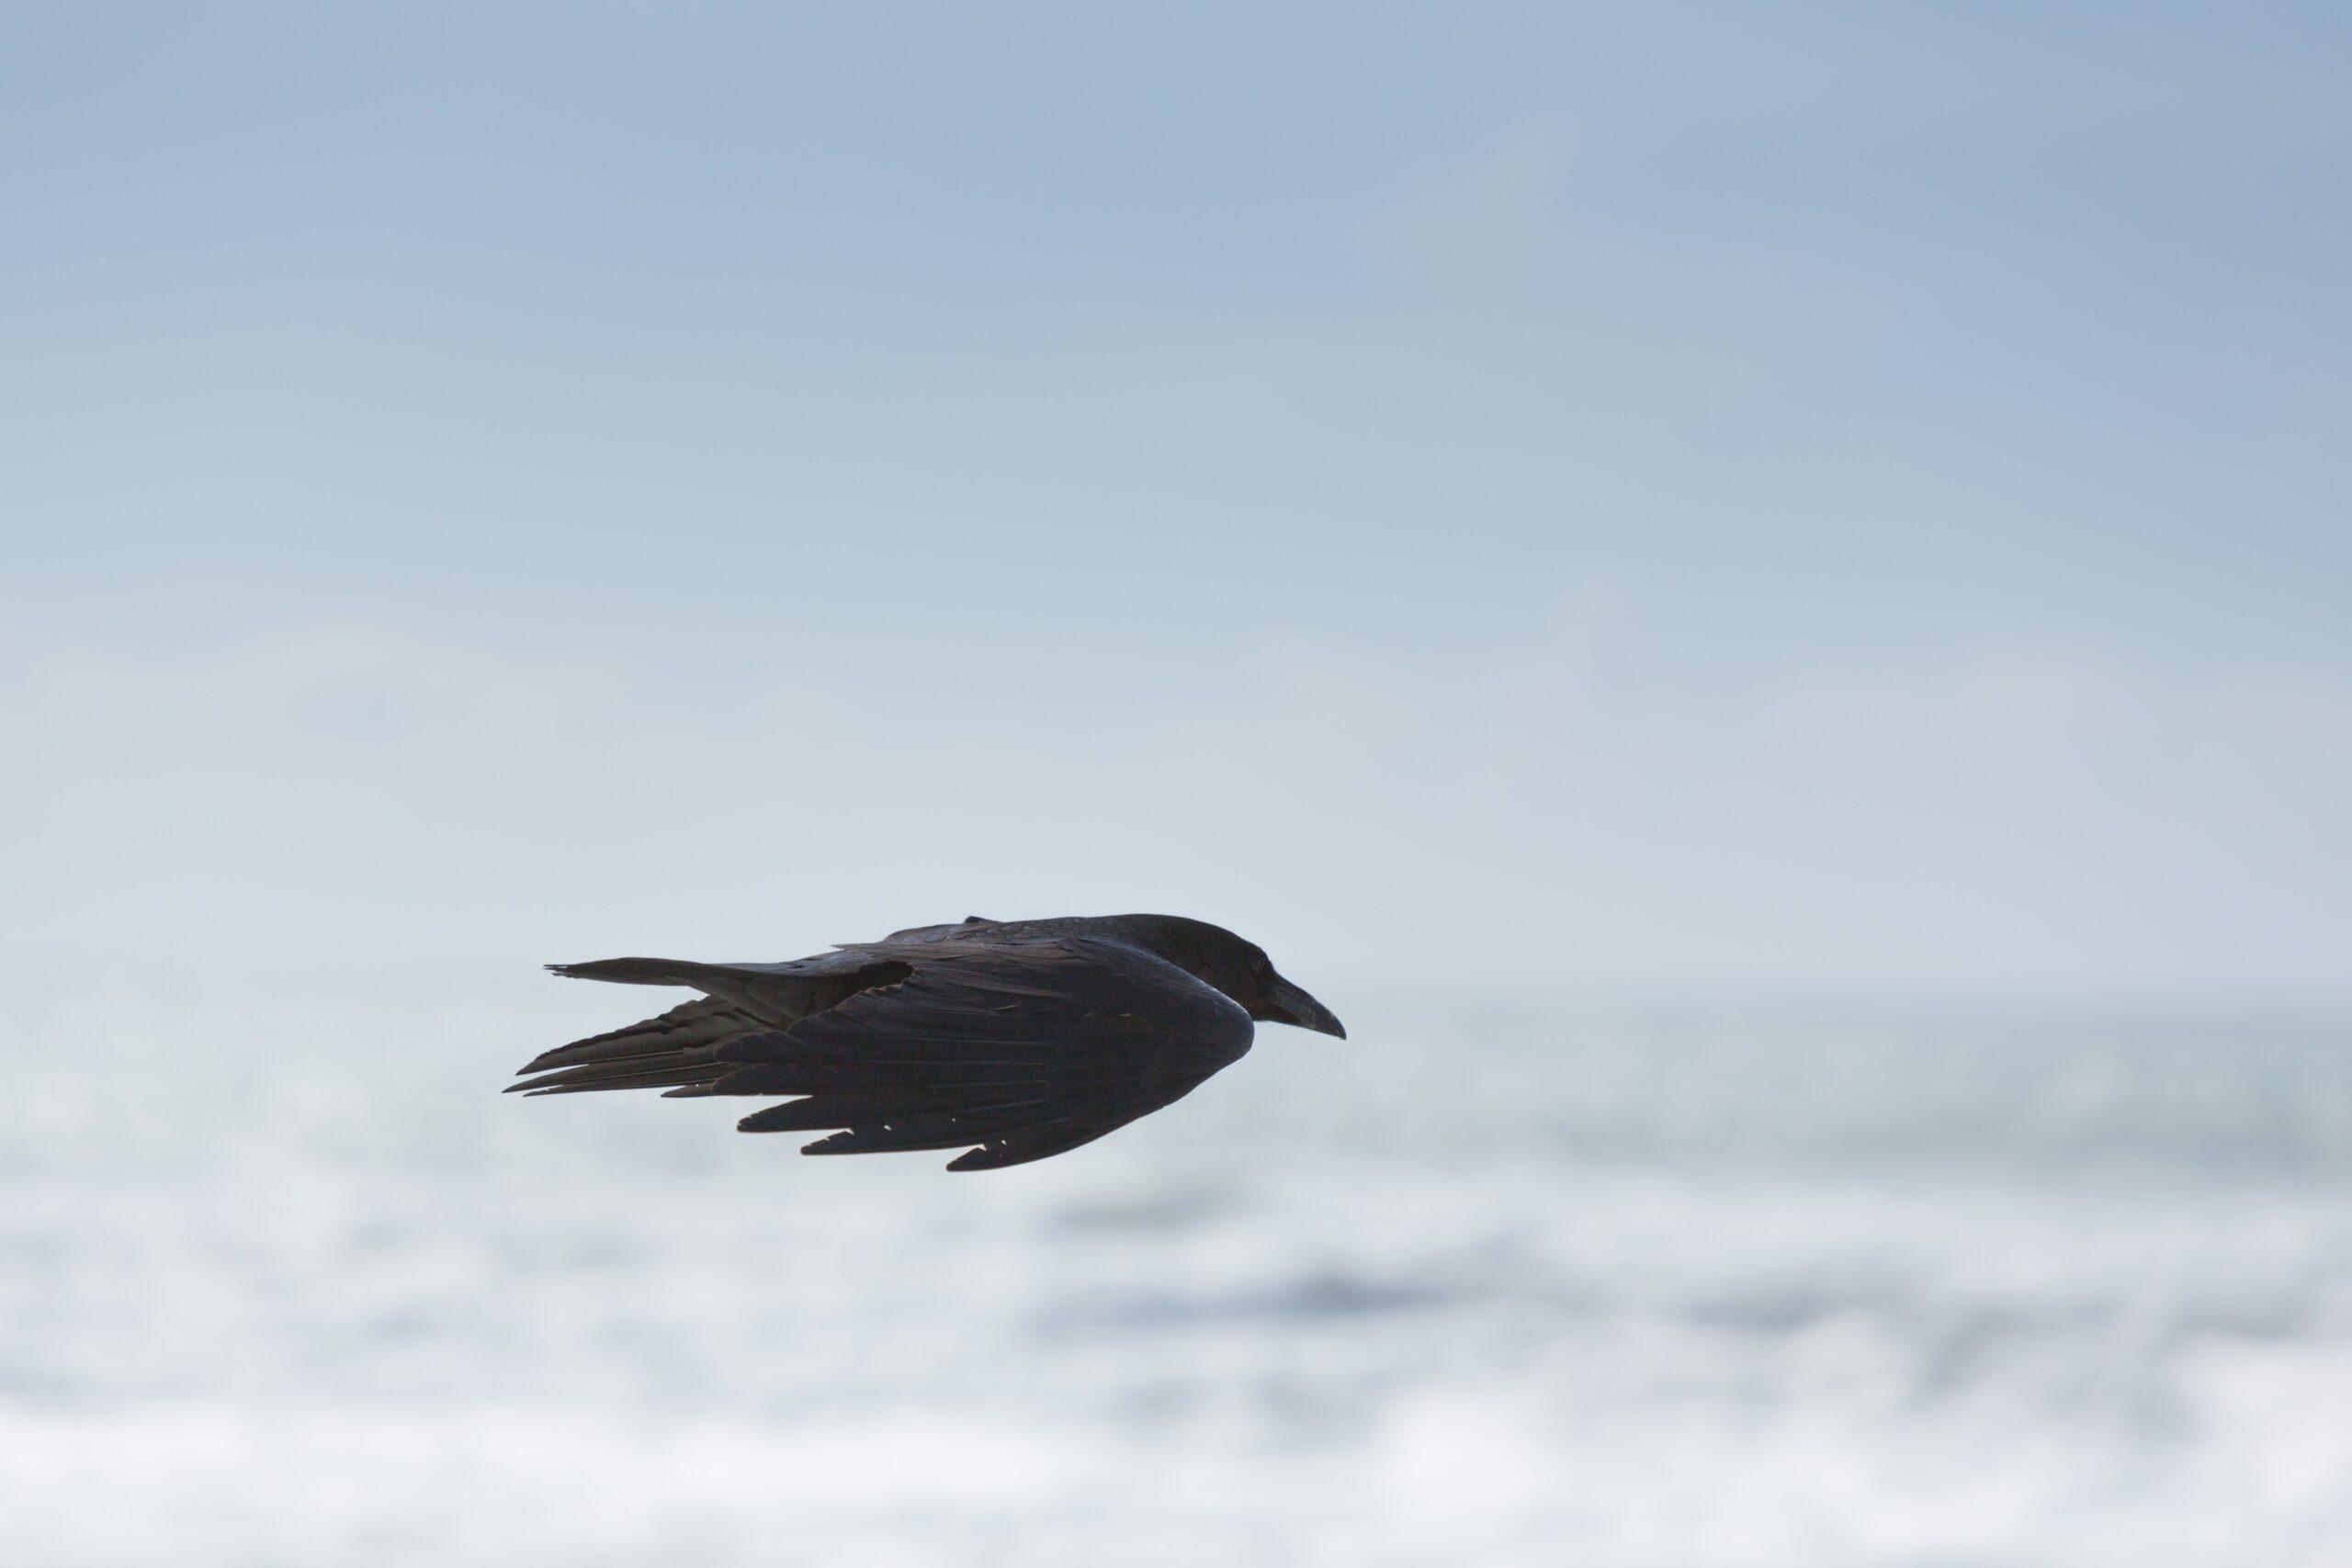 ignacio-giri-Black Crow in flight-unsplash